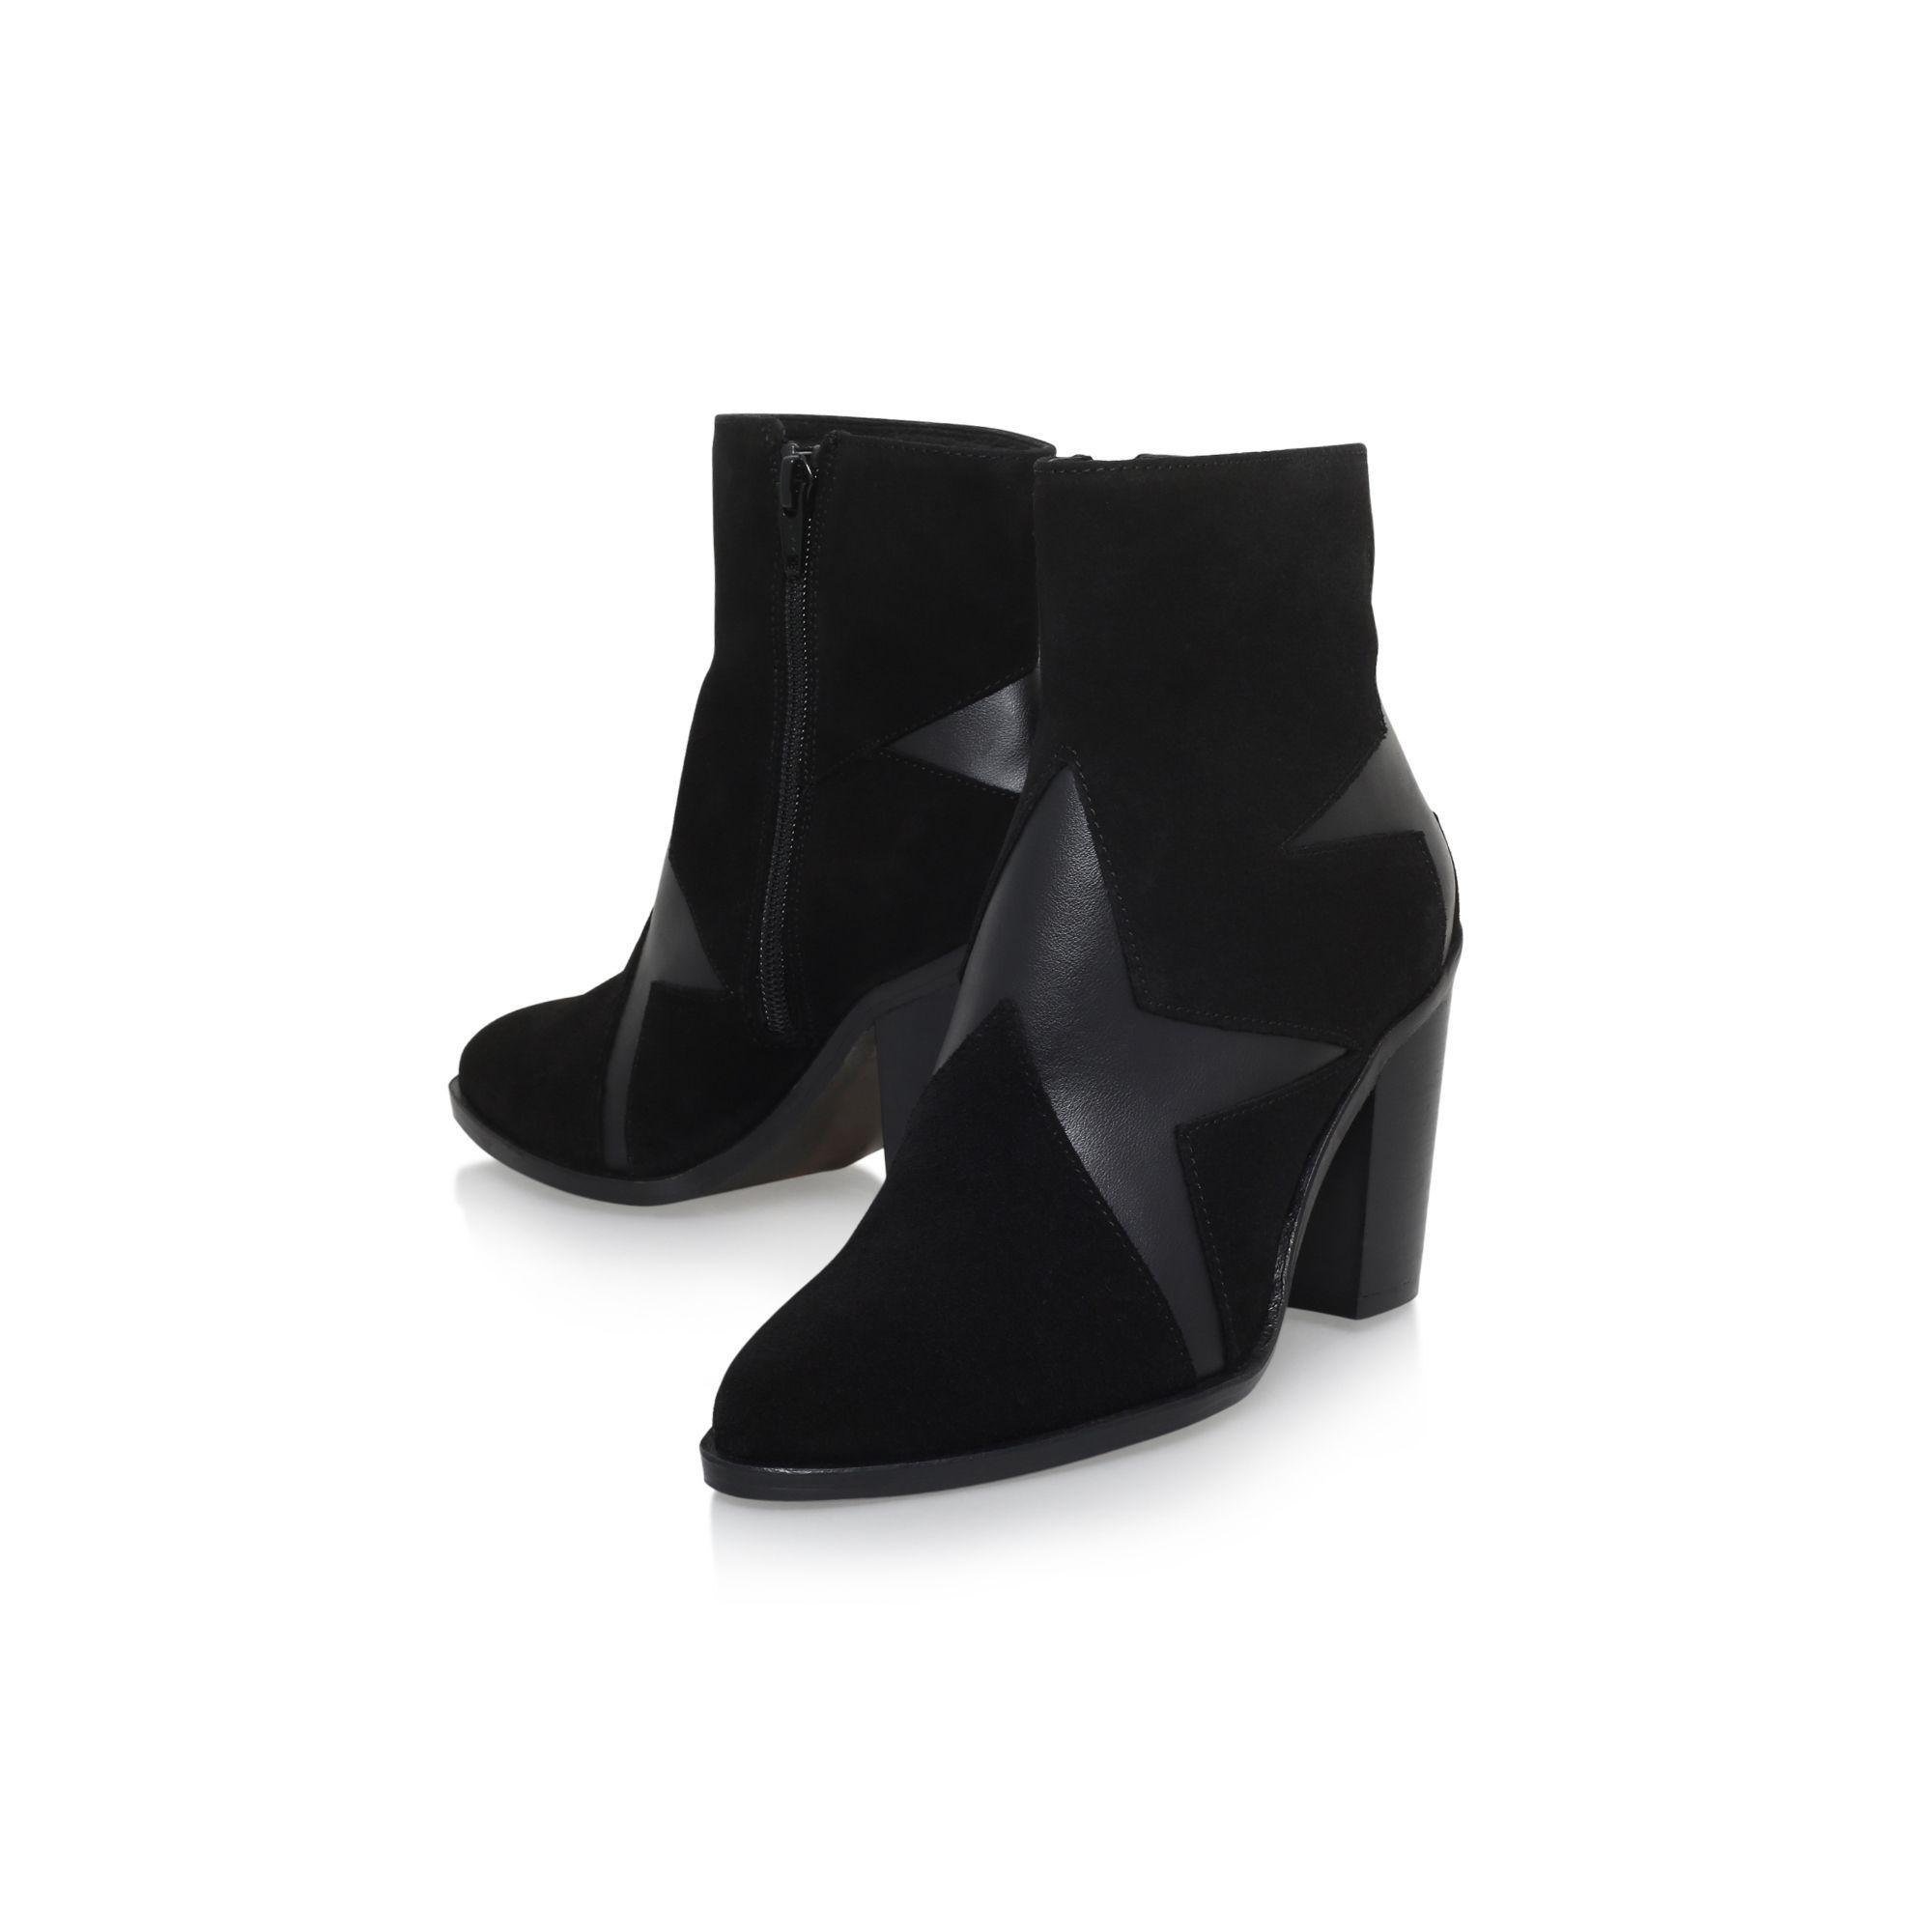 KG by Kurt Geiger Black 'skywalk' High Heel Zip Up Ankle Boot